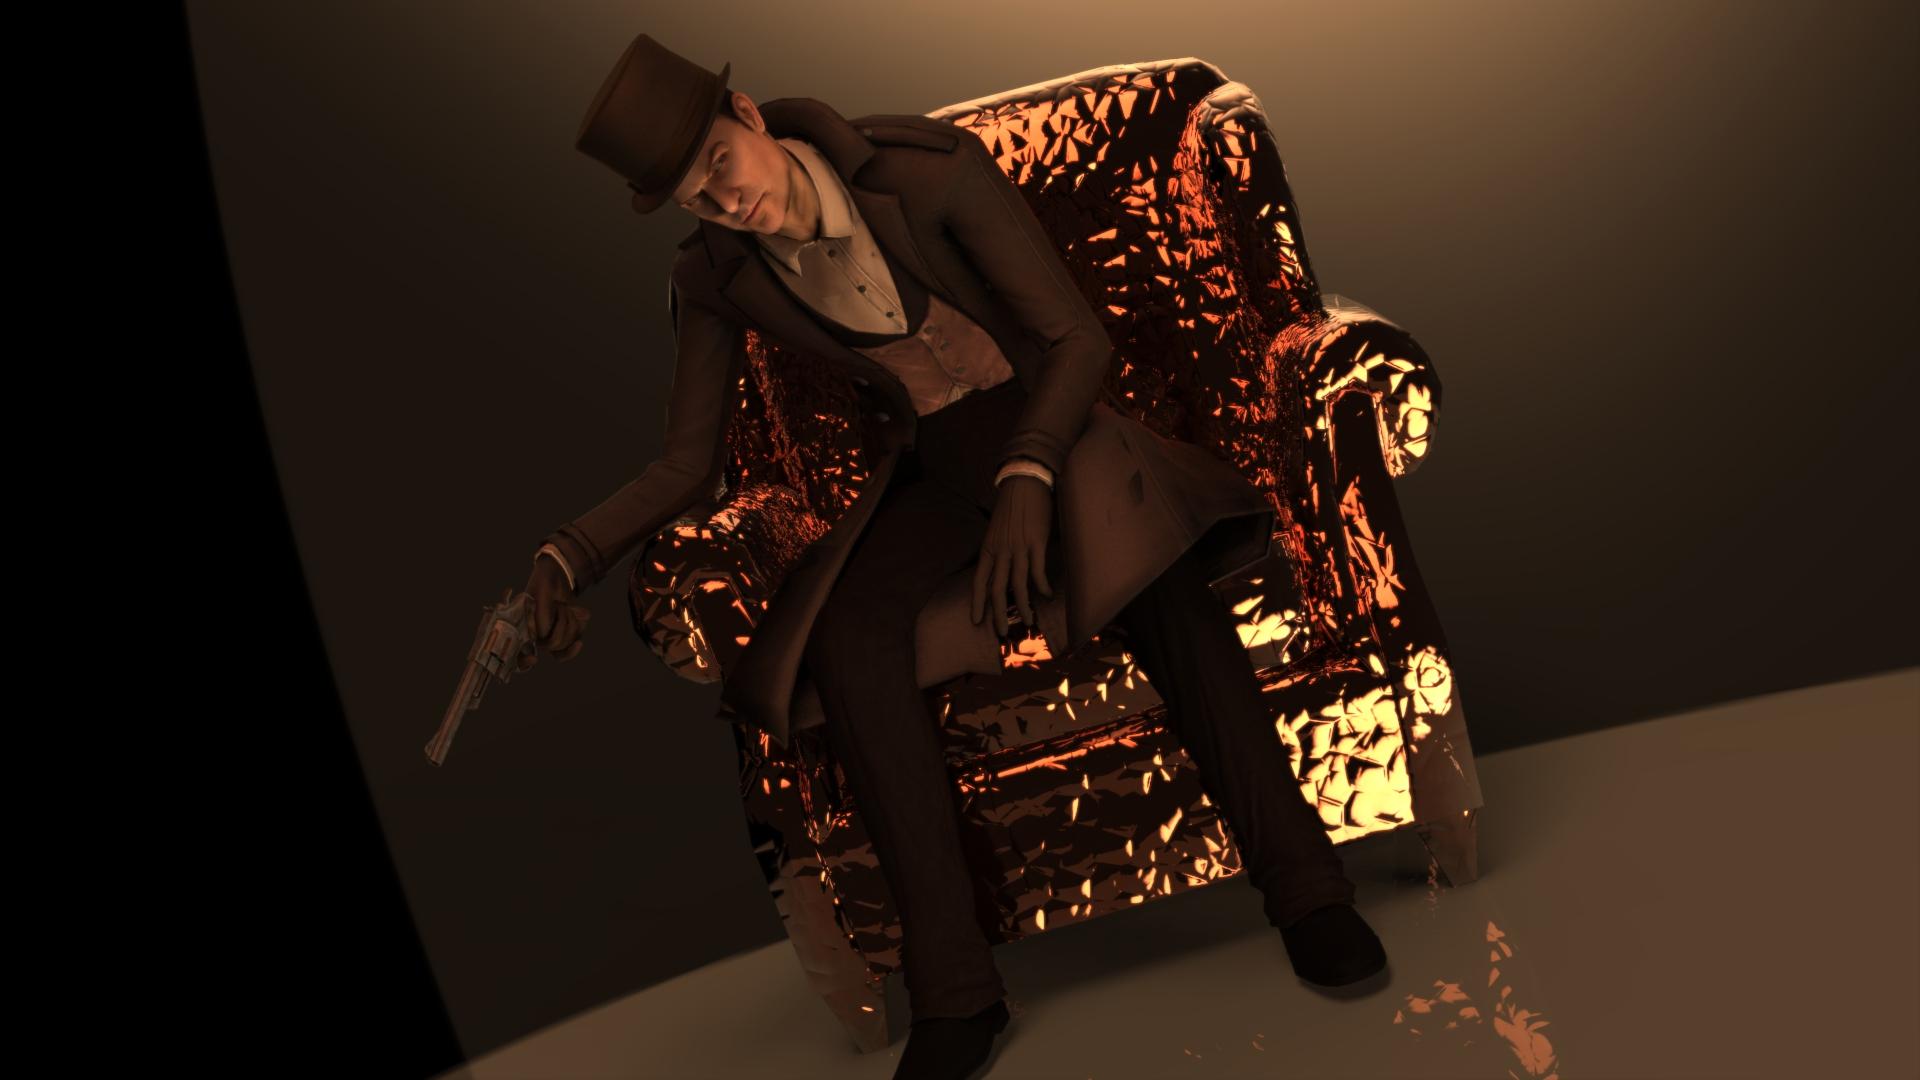 Sherlock Render By Lexaholmes On Deviantart